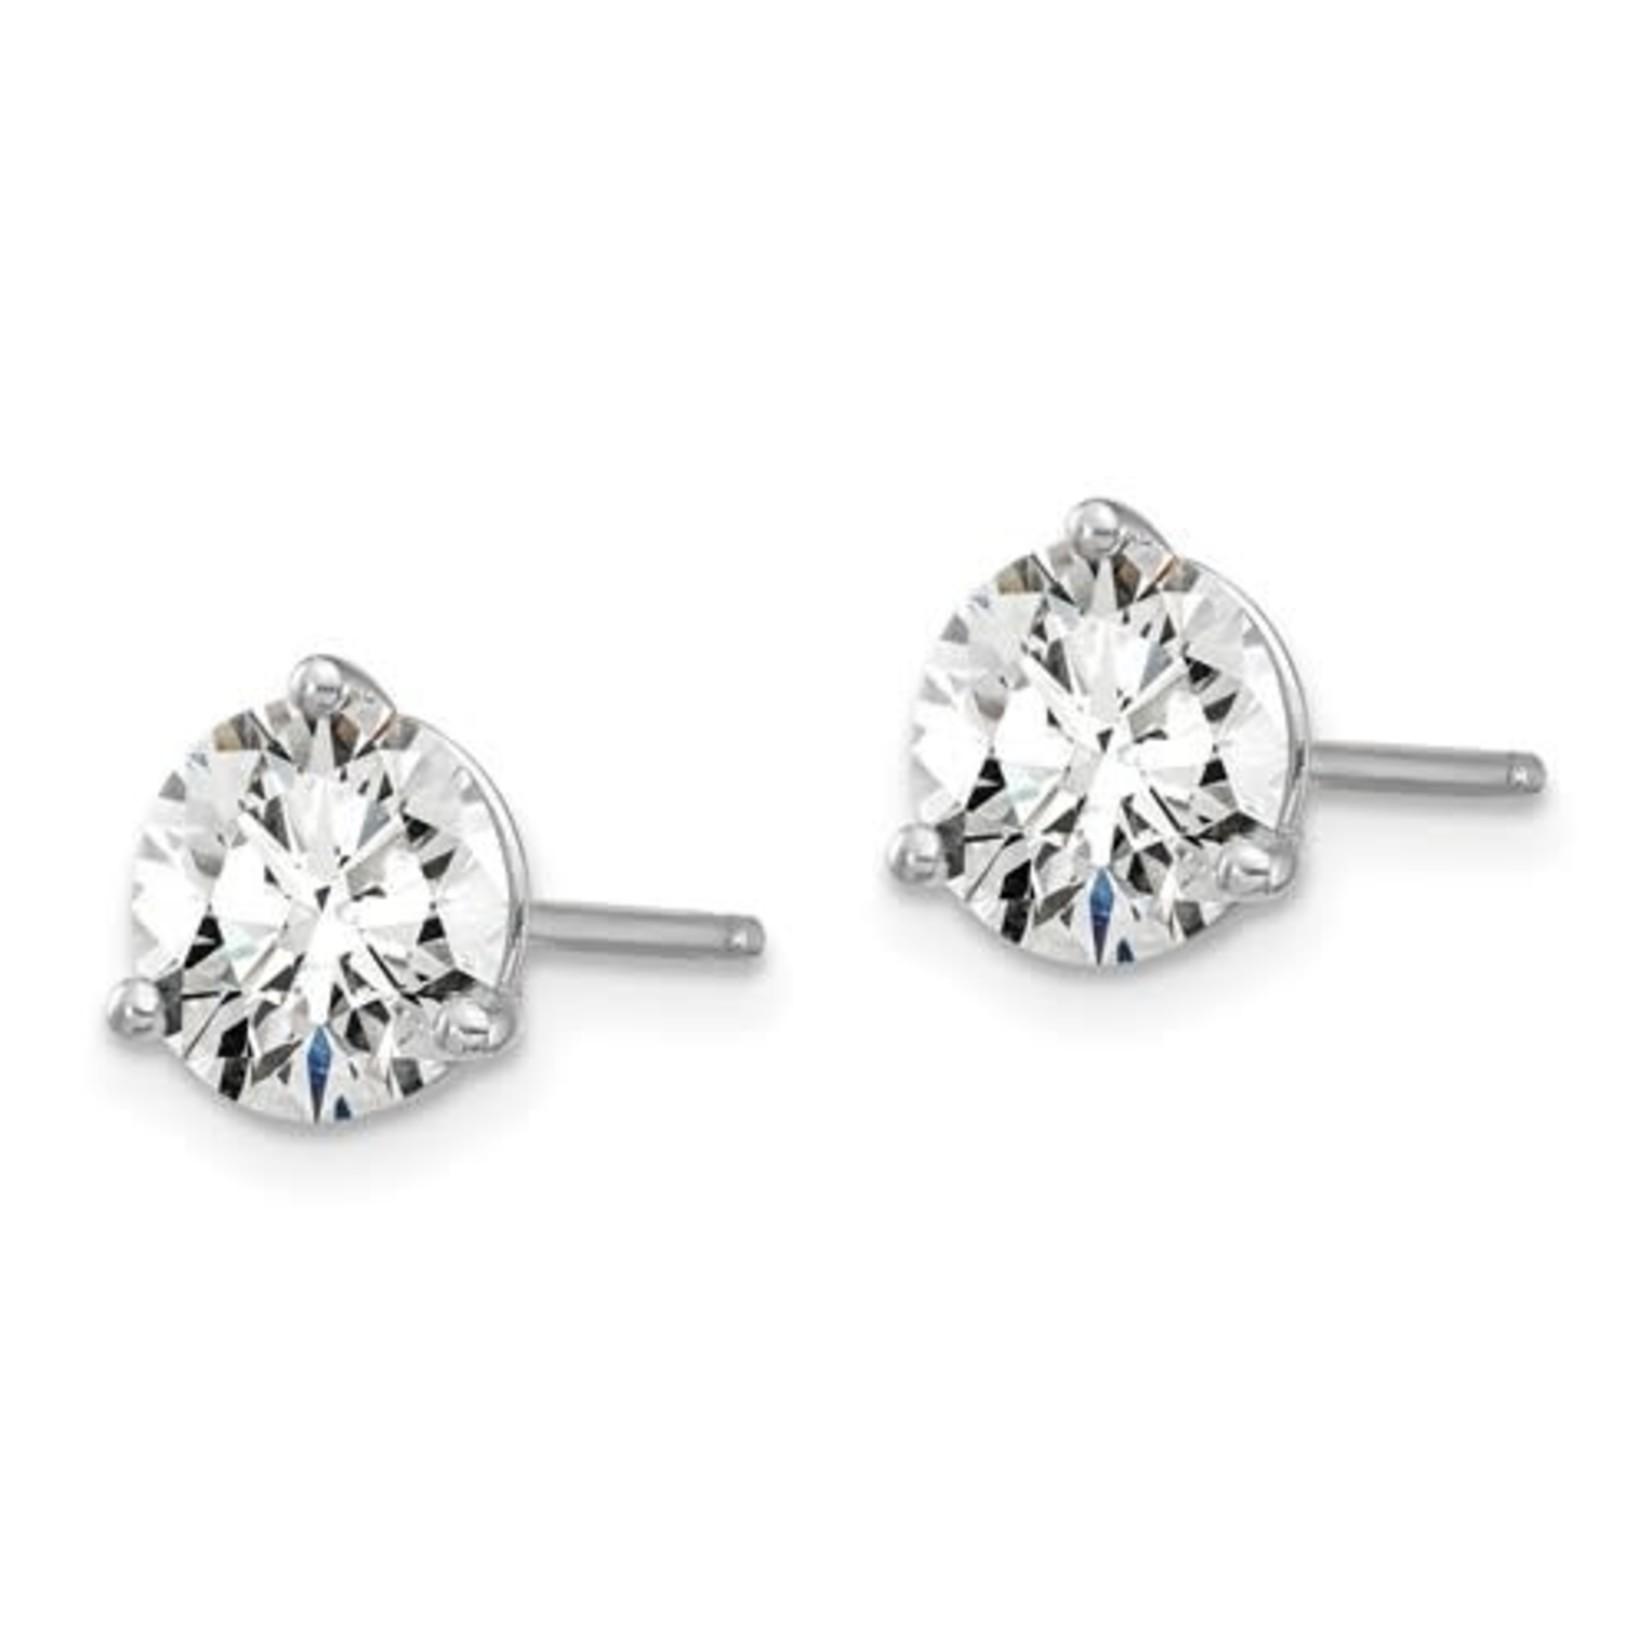 On The Edge Diamond Earrings - 2.0ctw